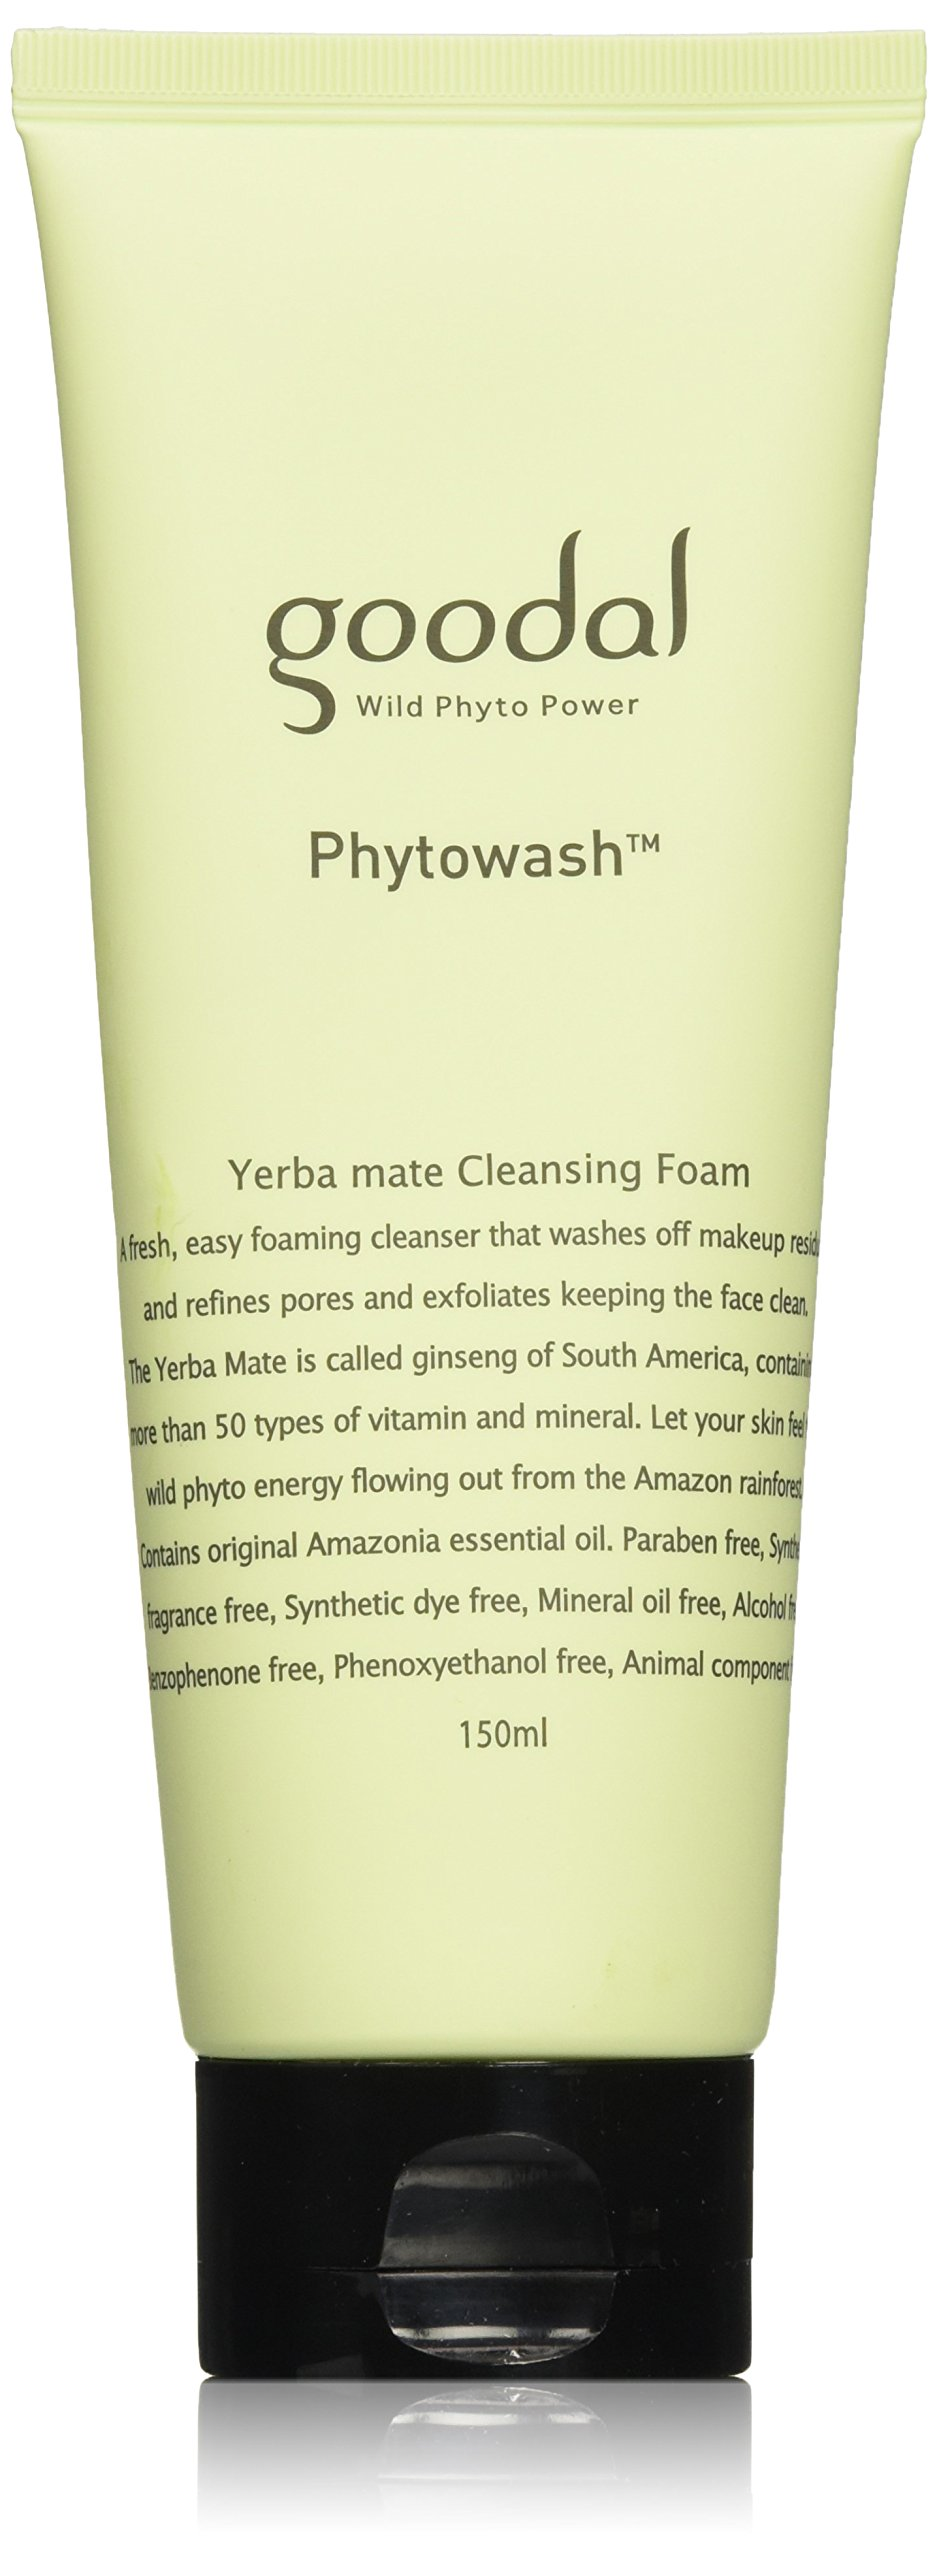 Goodal Phytowash Yerba Mate Cleansing Foam, 5.07 Fluid Ounce